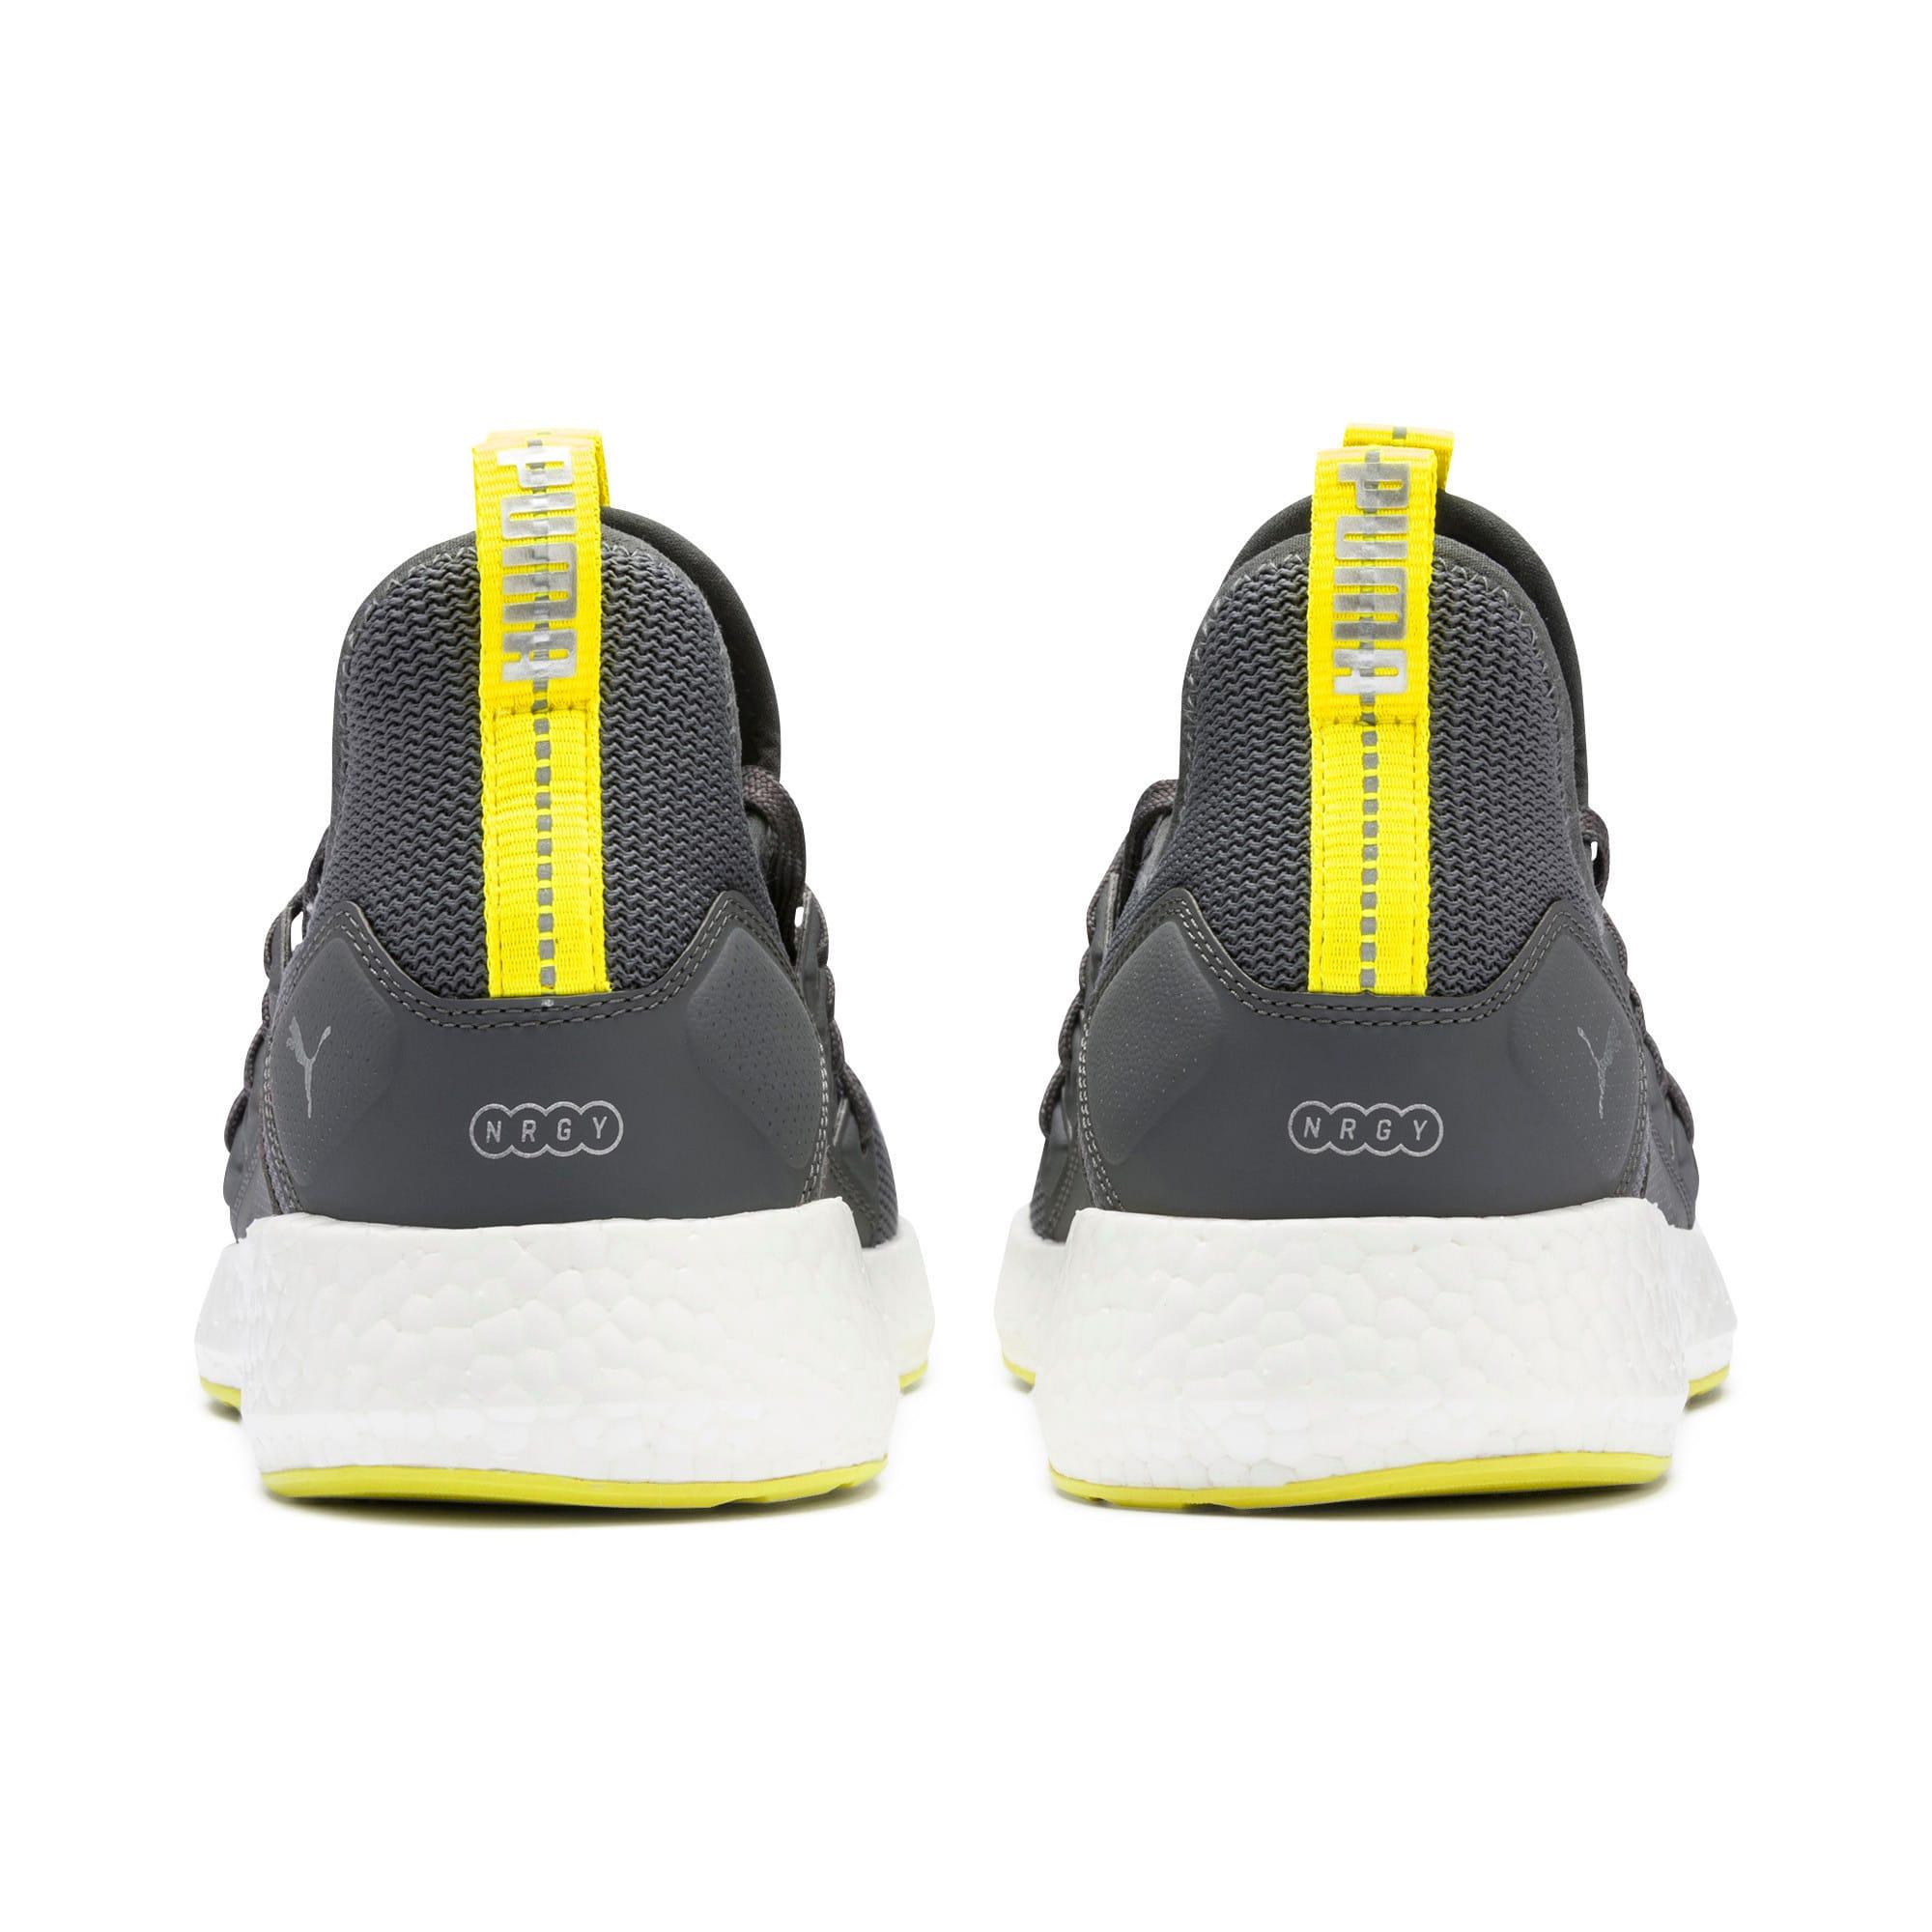 Thumbnail 6 of NRGY Neko Lights Men's Running Shoes, CASTLEROCK-Yellow Alert, medium-IND